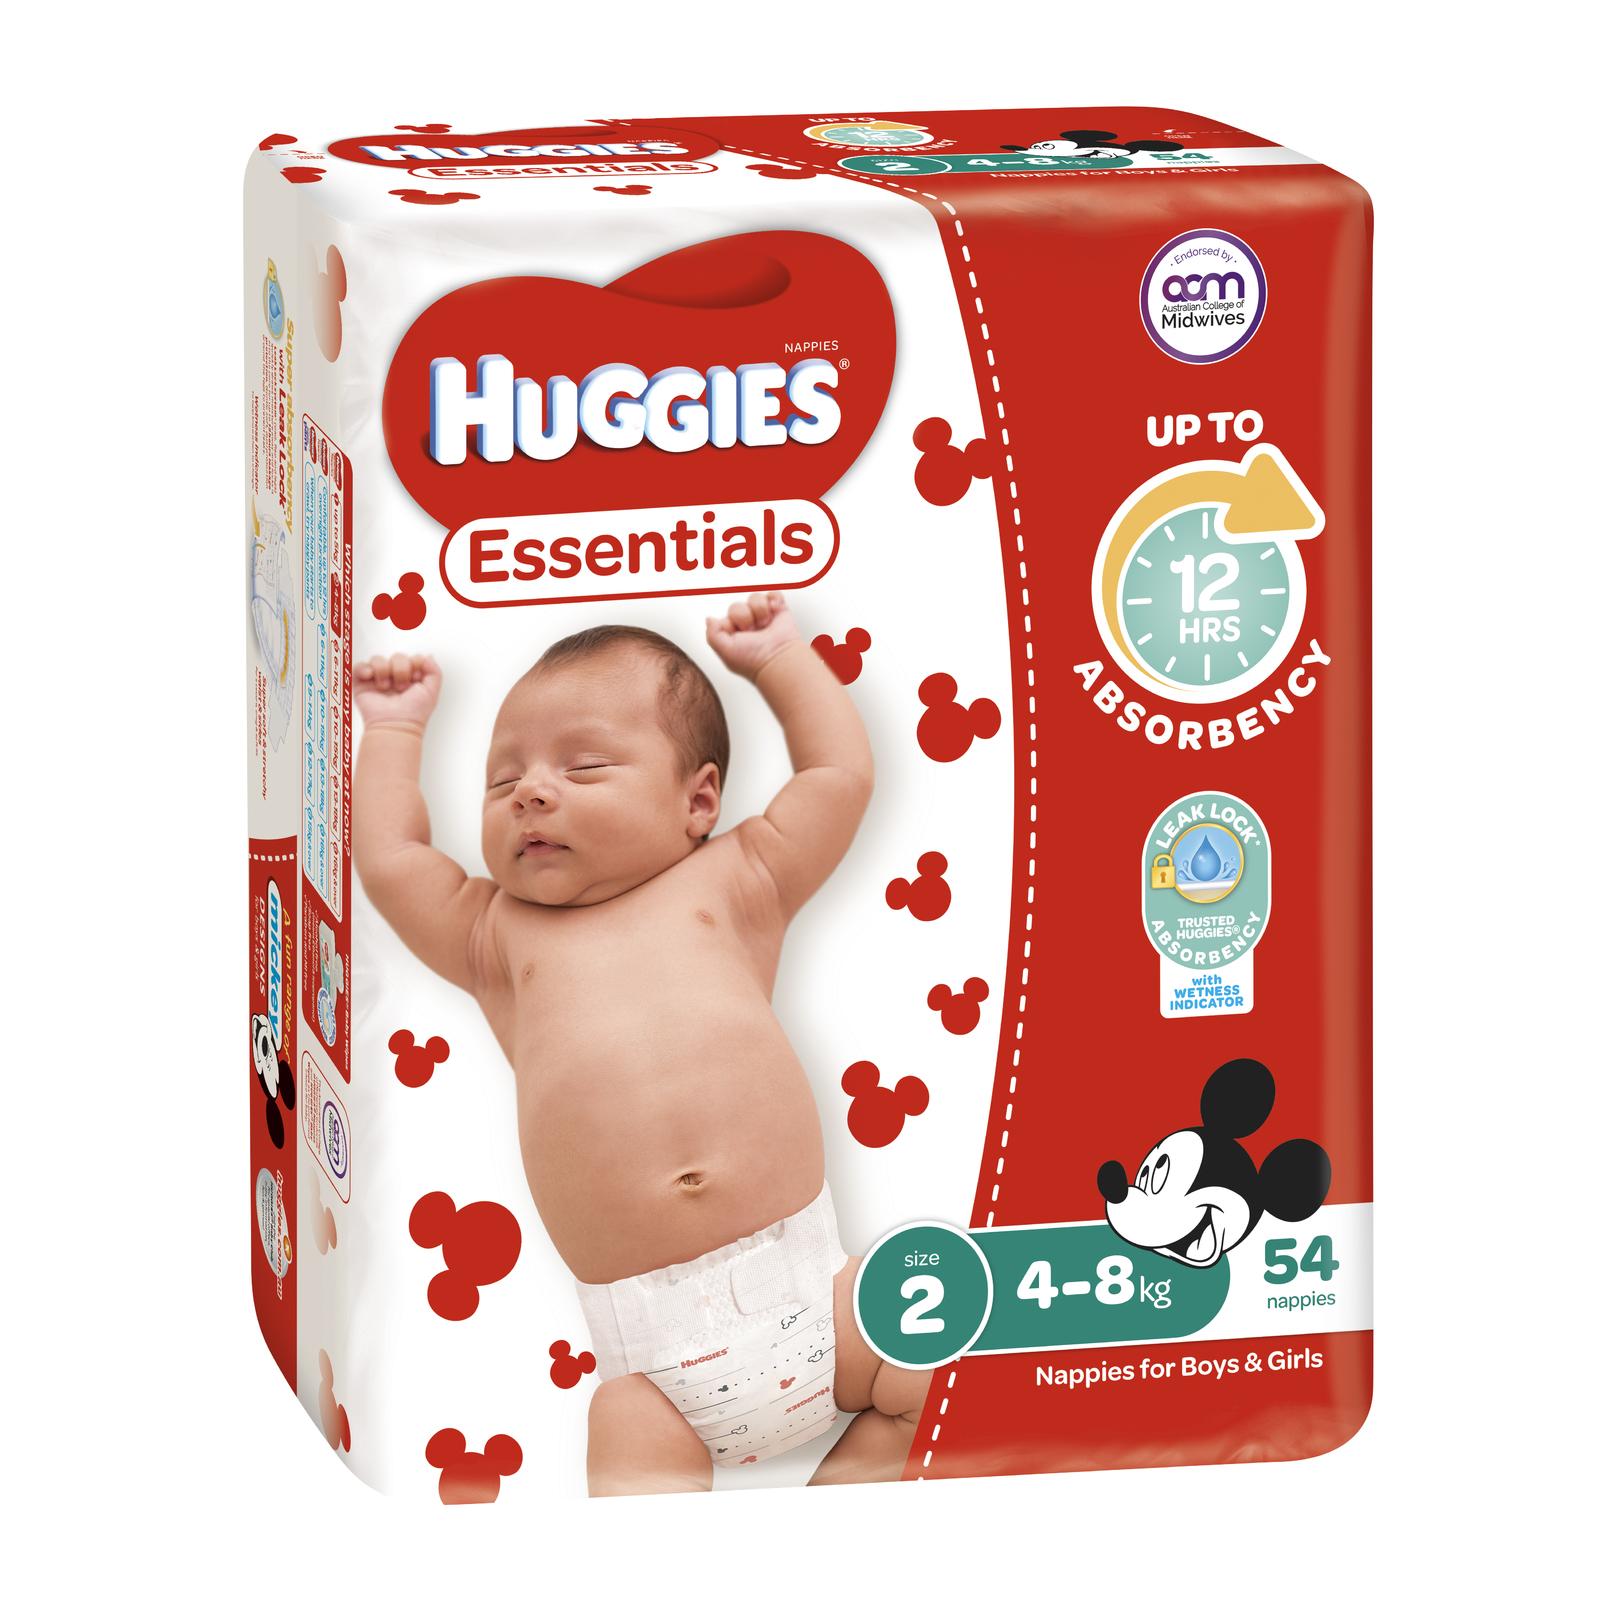 Huggies Essentials Nappies Bulk - Size 2 Infant (54) image